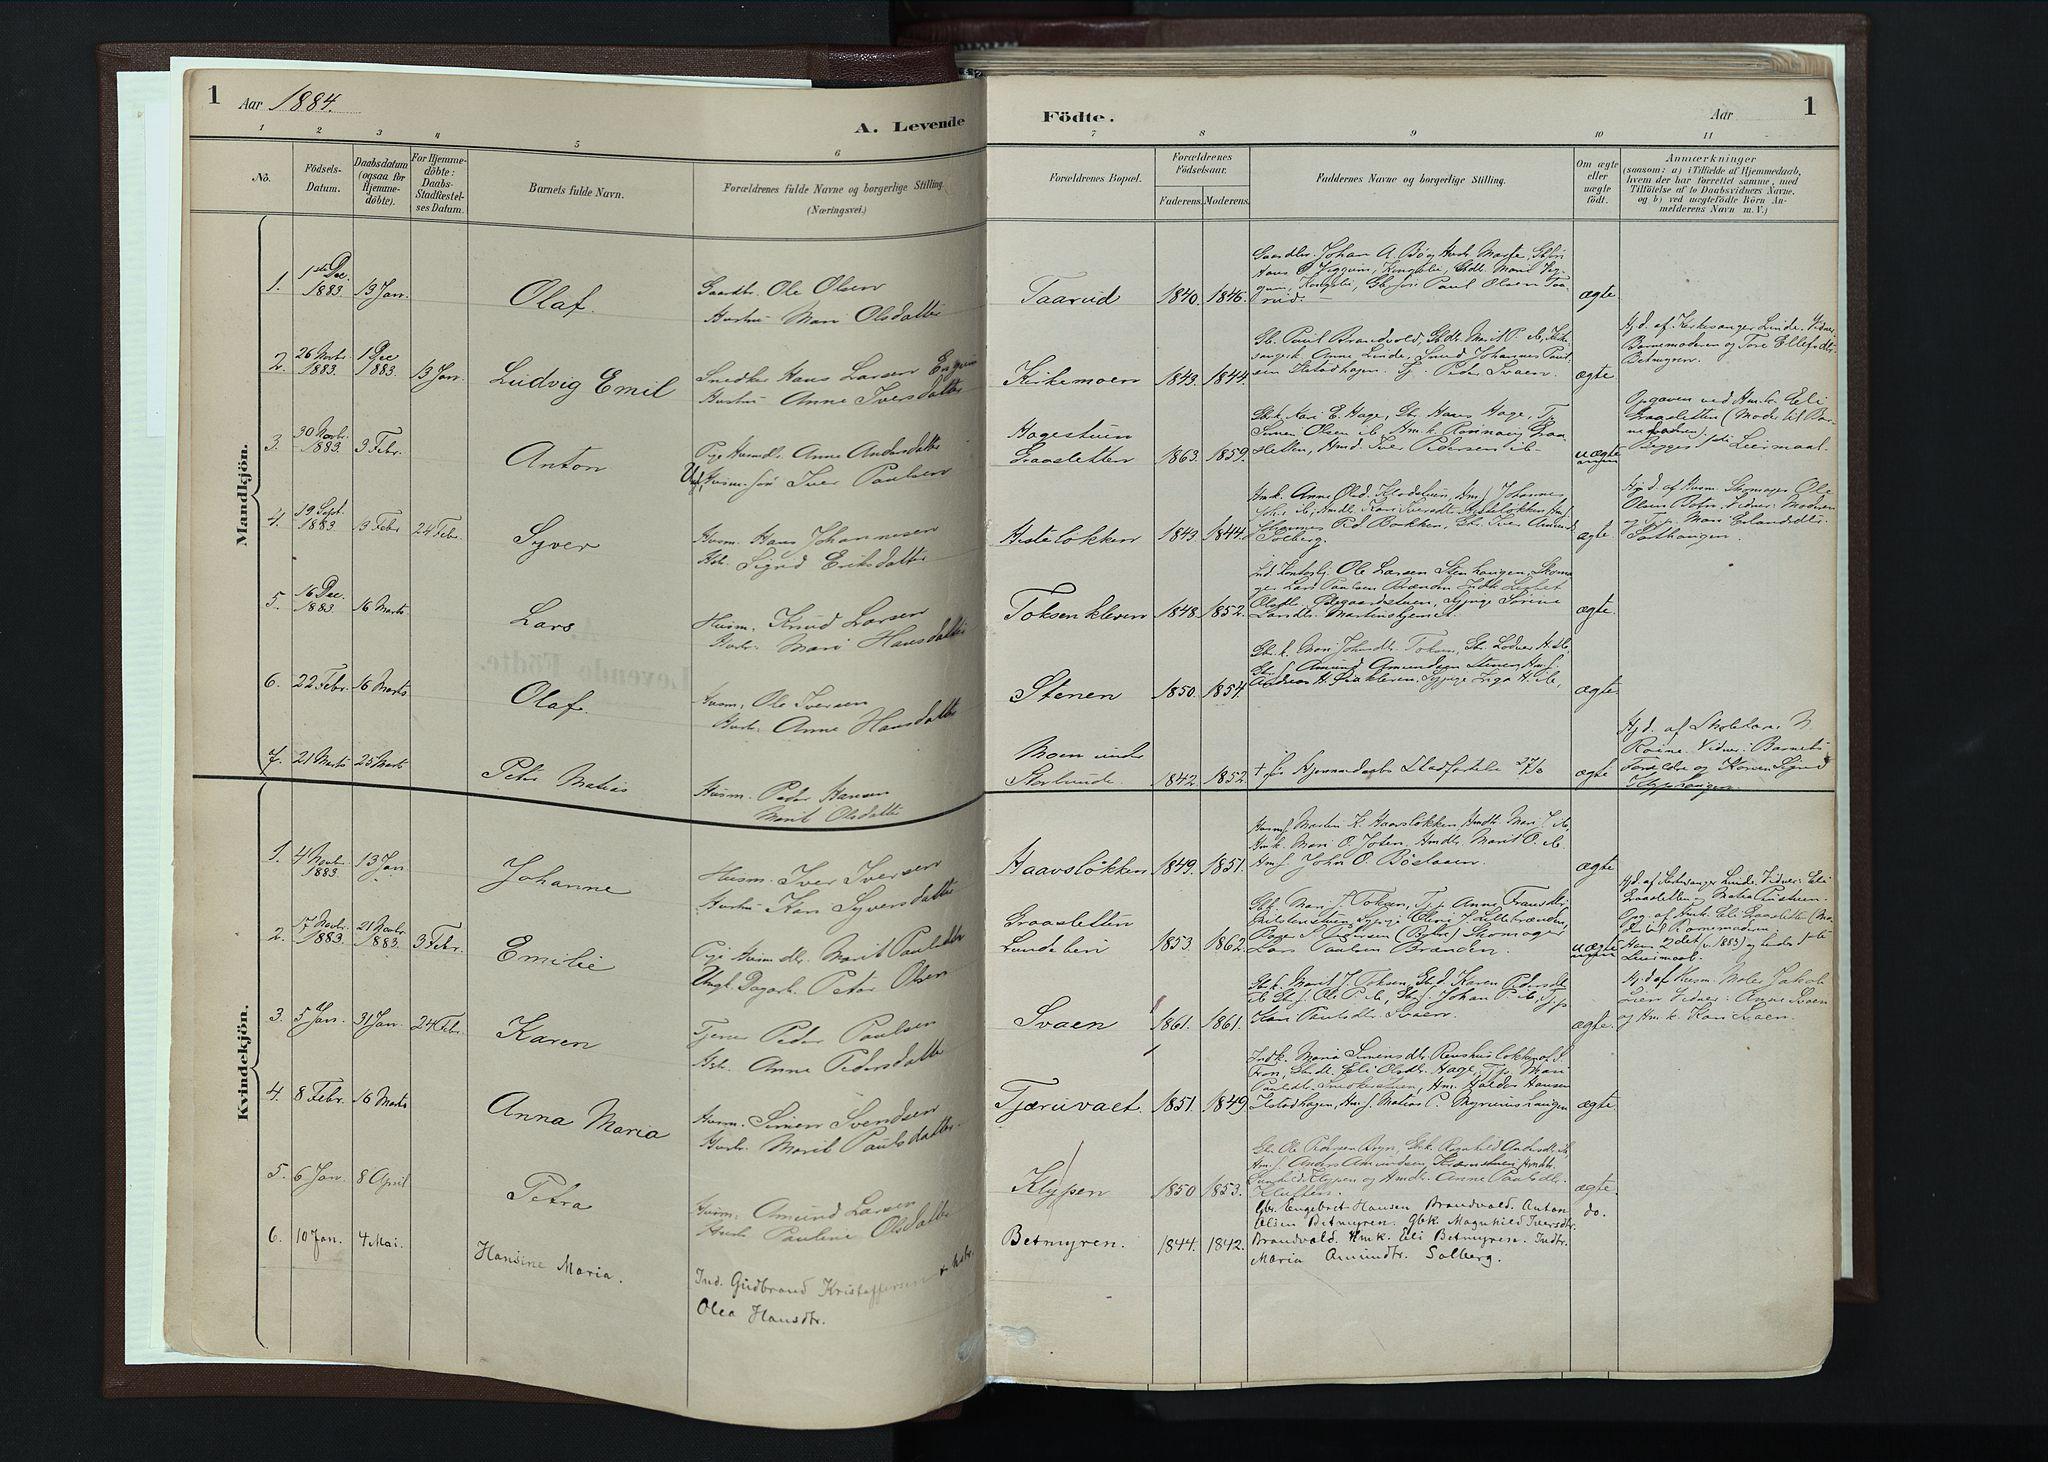 SAH, Nord-Fron prestekontor, Ministerialbok nr. 4, 1884-1914, s. 1